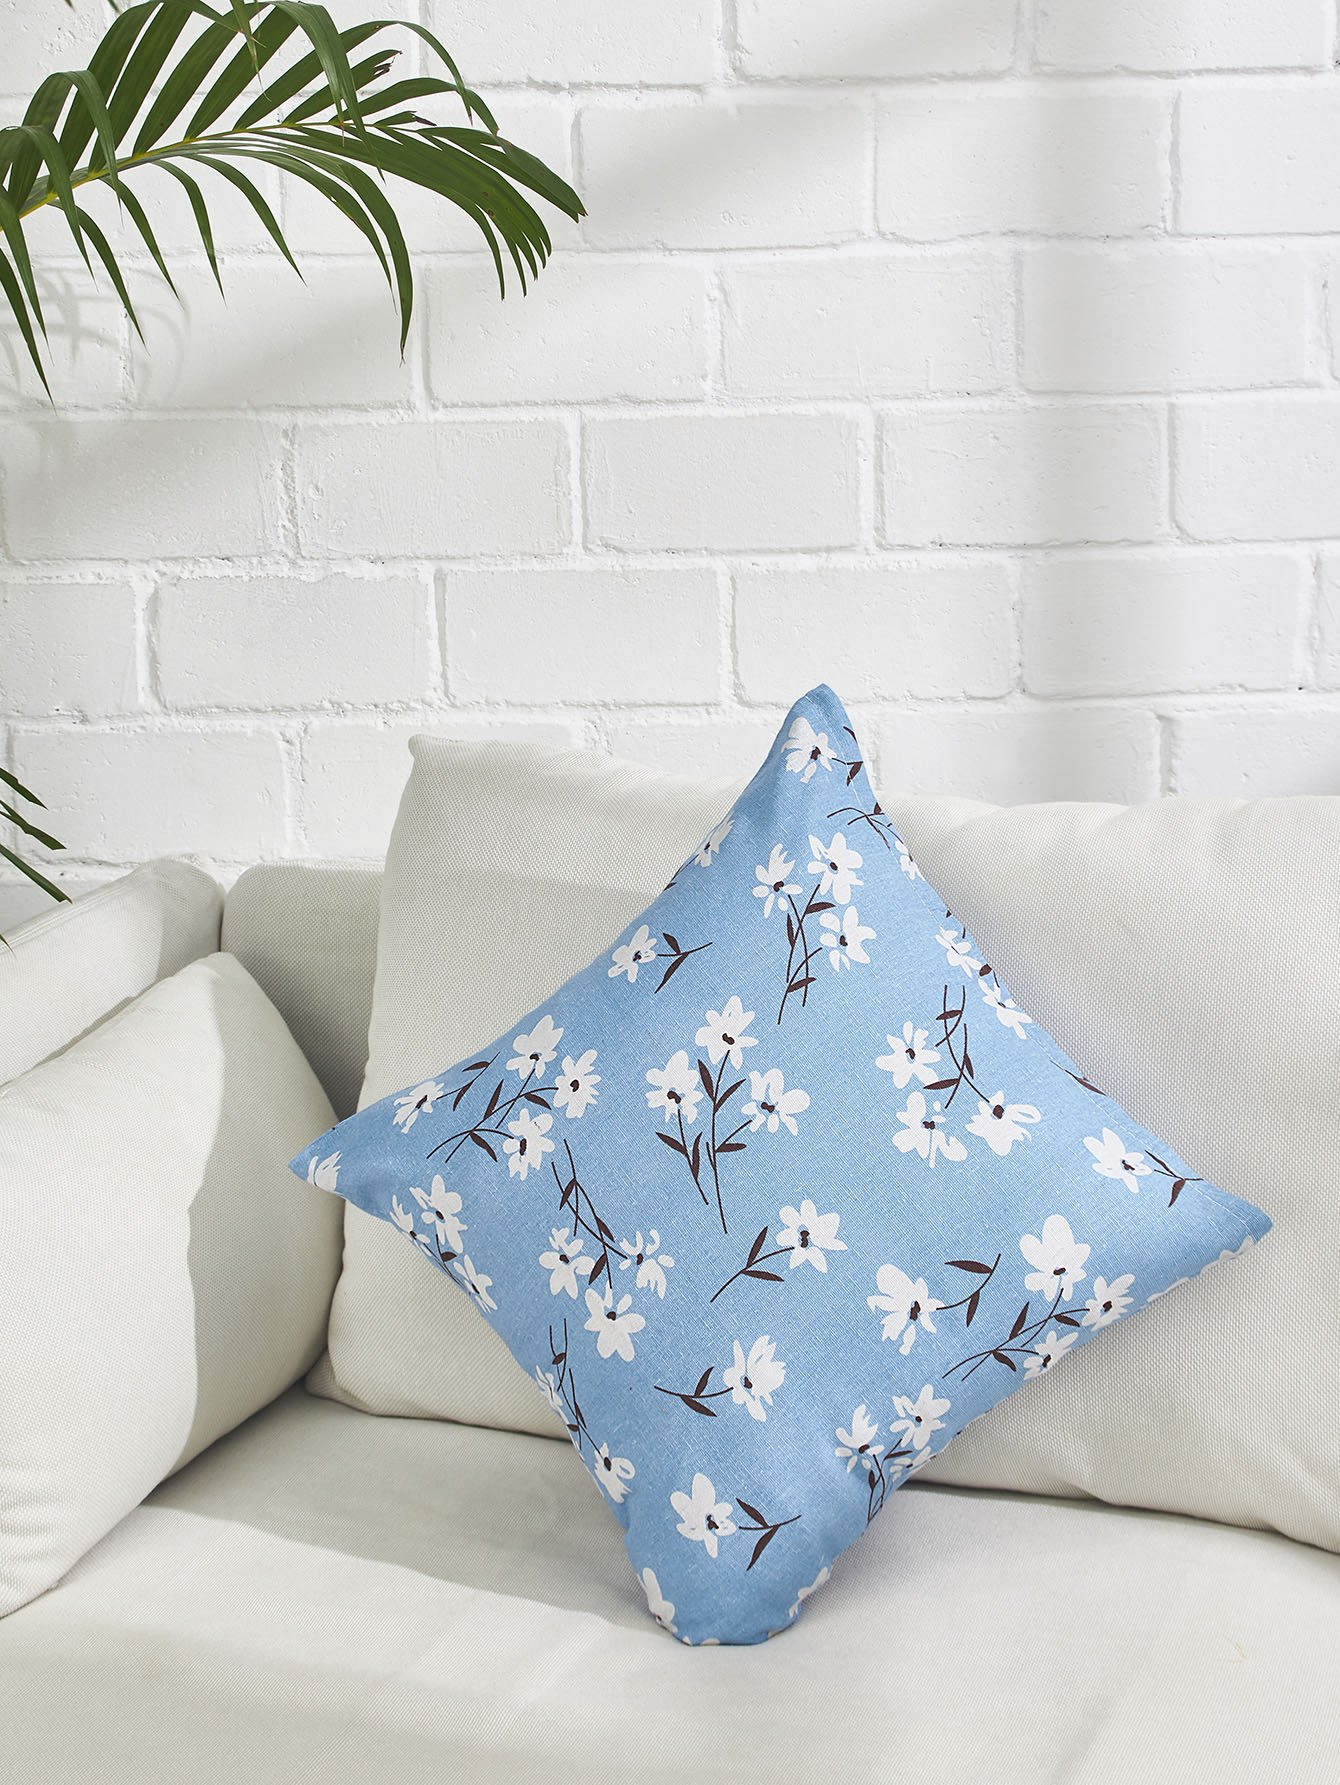 Flower Print Pillowcase Cover panda print linen pillowcase cover